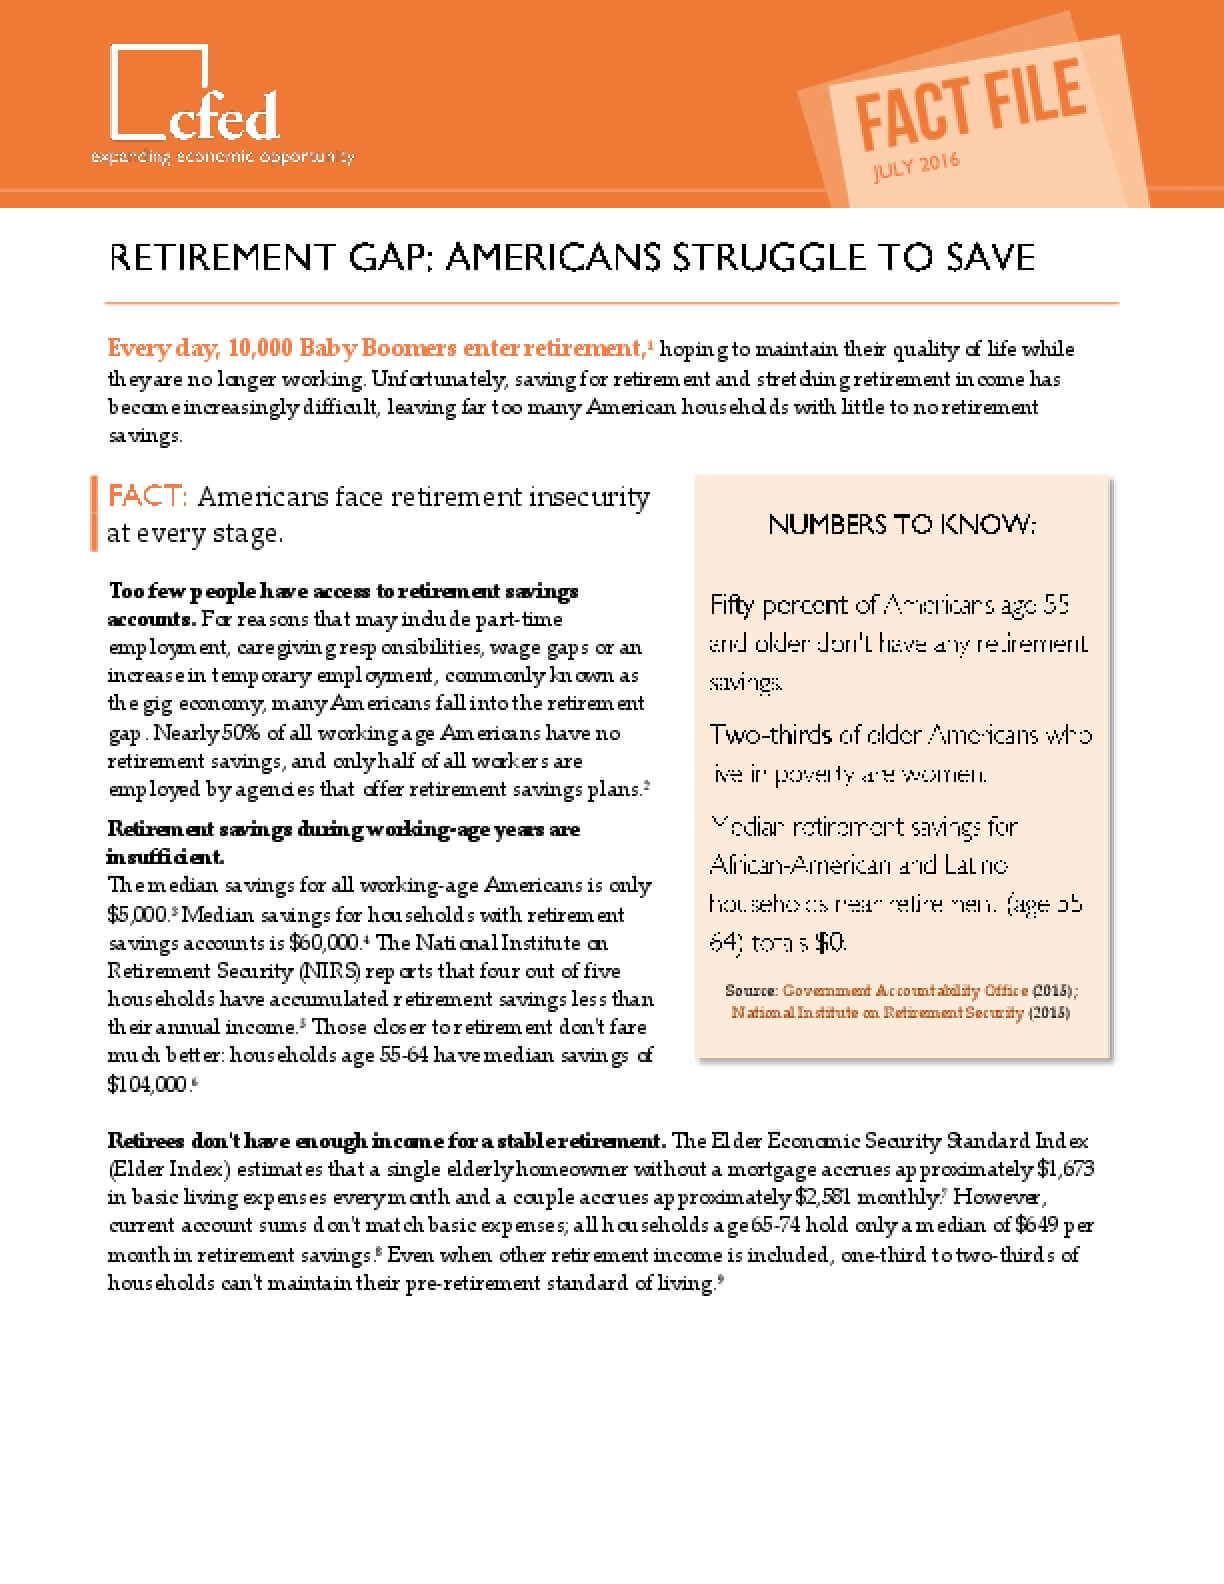 Retirement Gap: Americans Struggle to Save